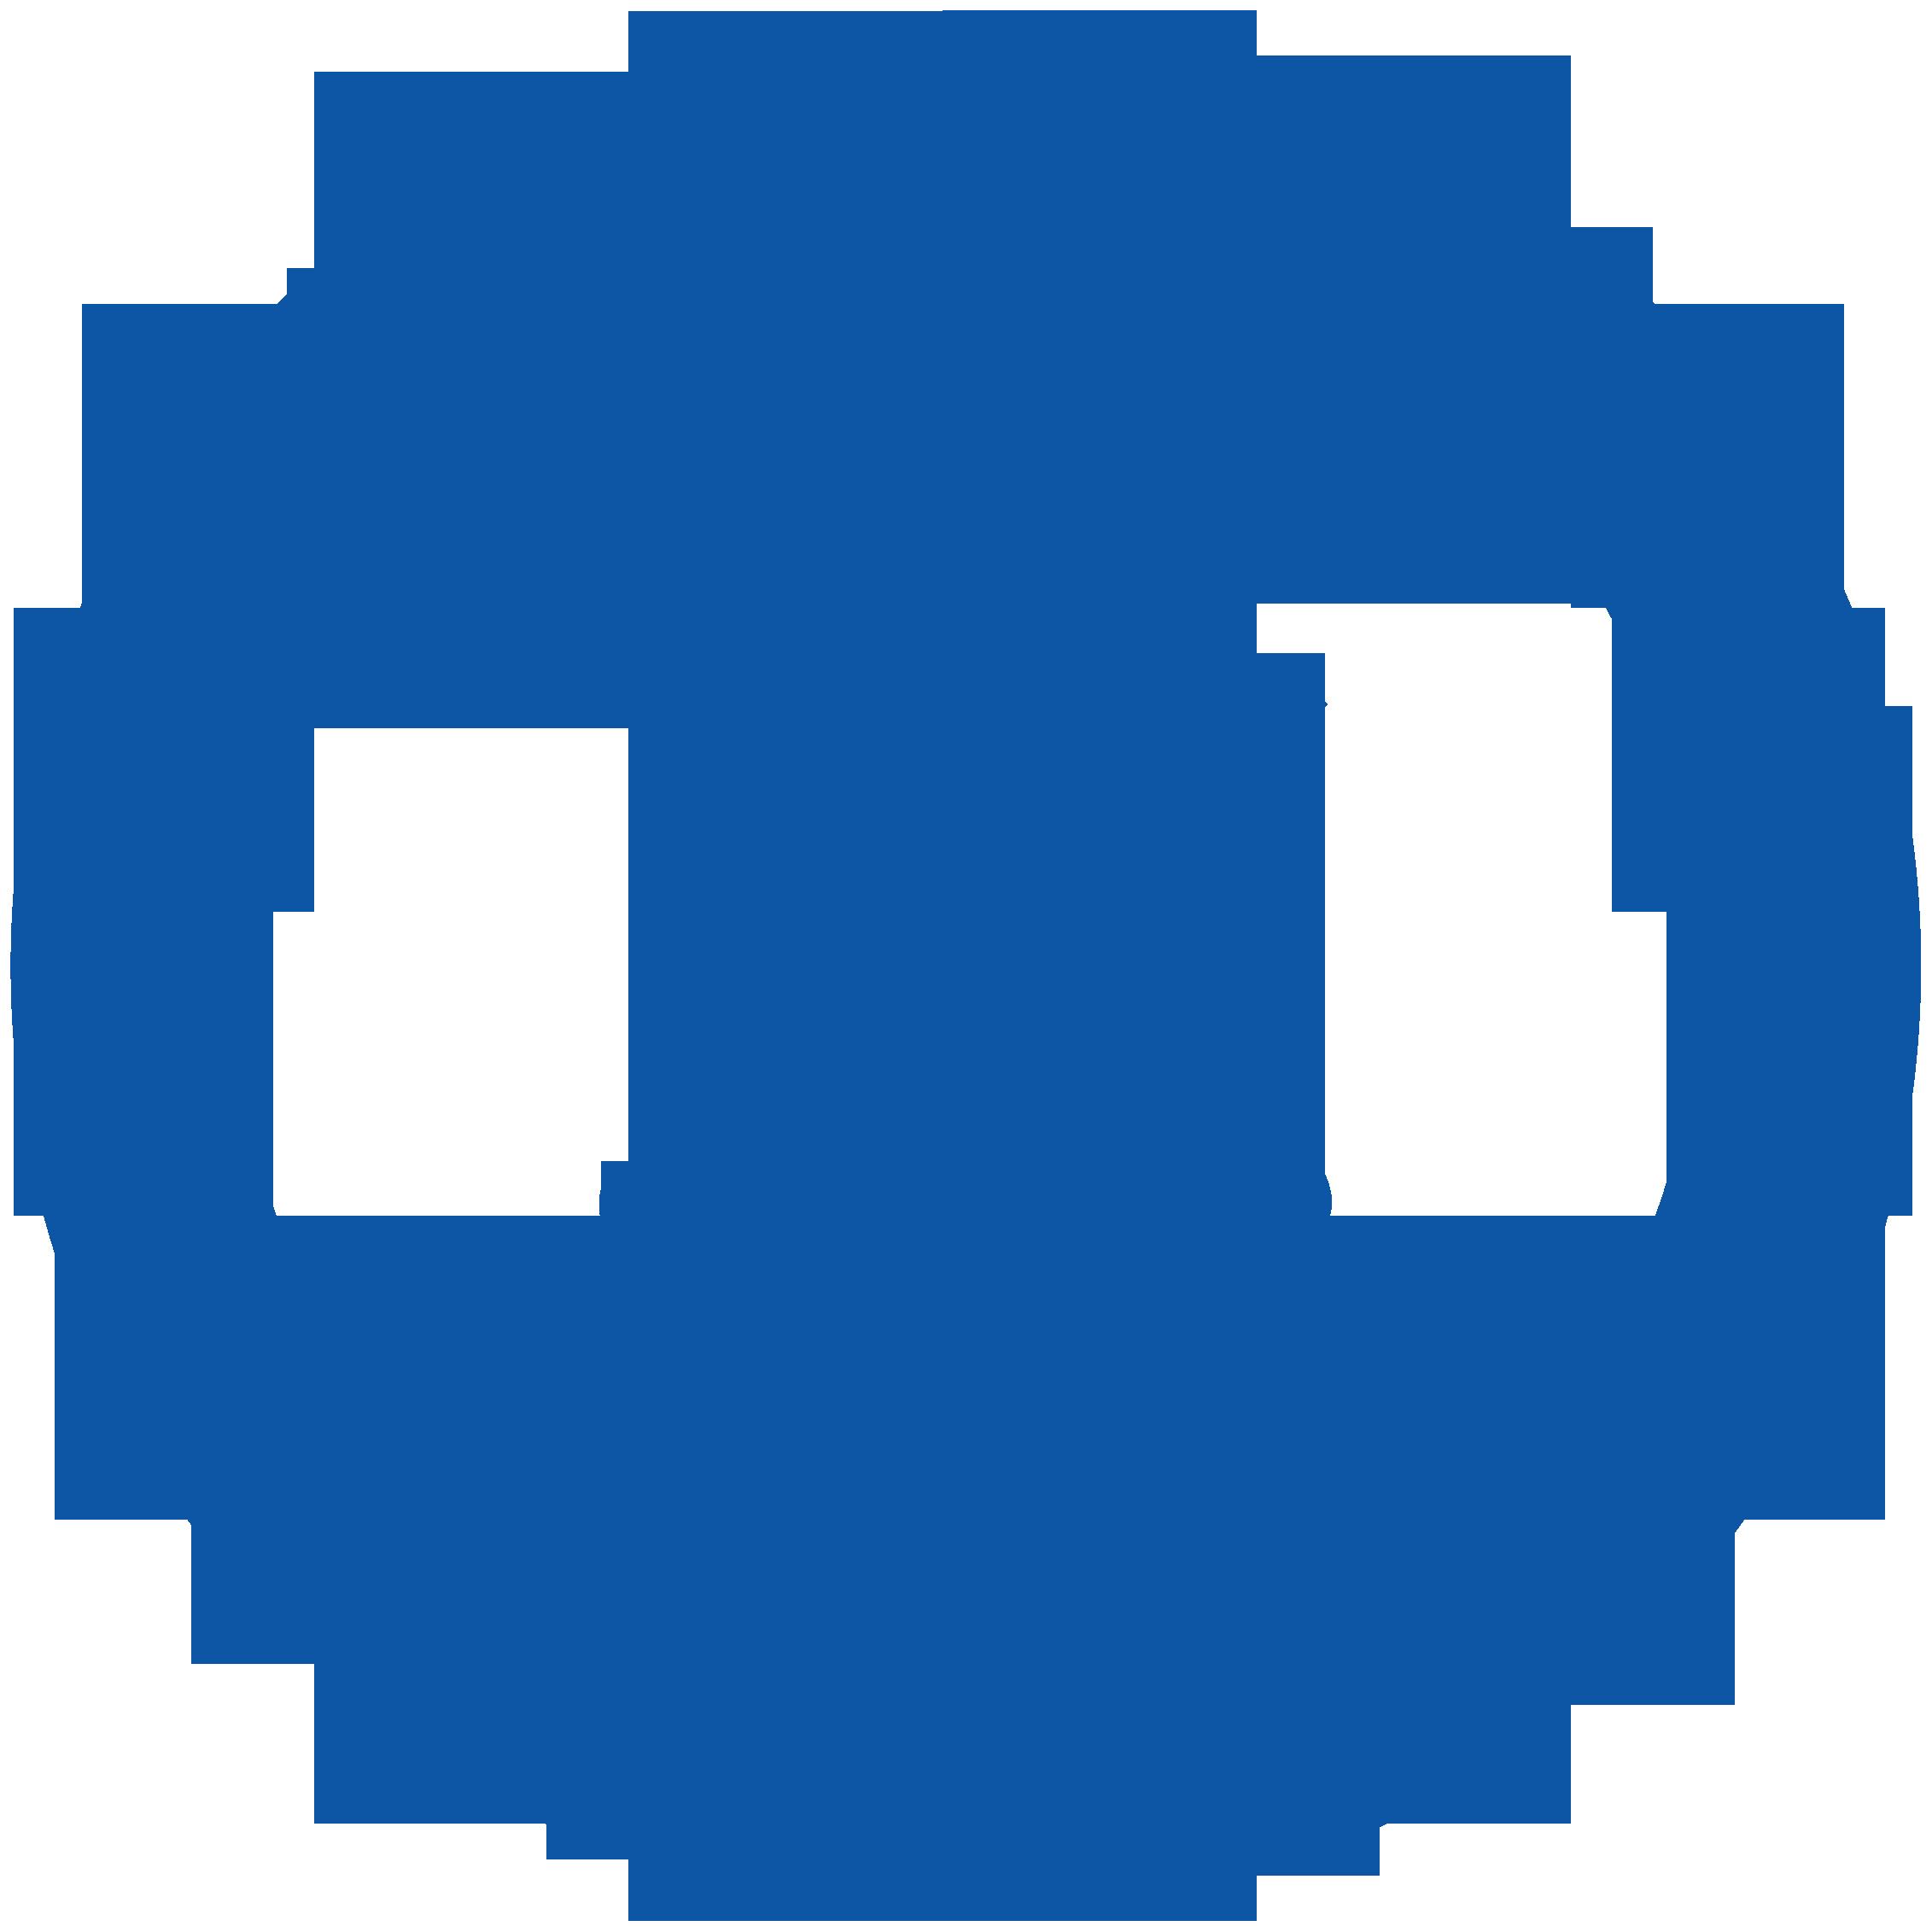 Beta sigma phi clip art 2015 clipart transparent library Phi Beta Sigma Seal free image clipart transparent library